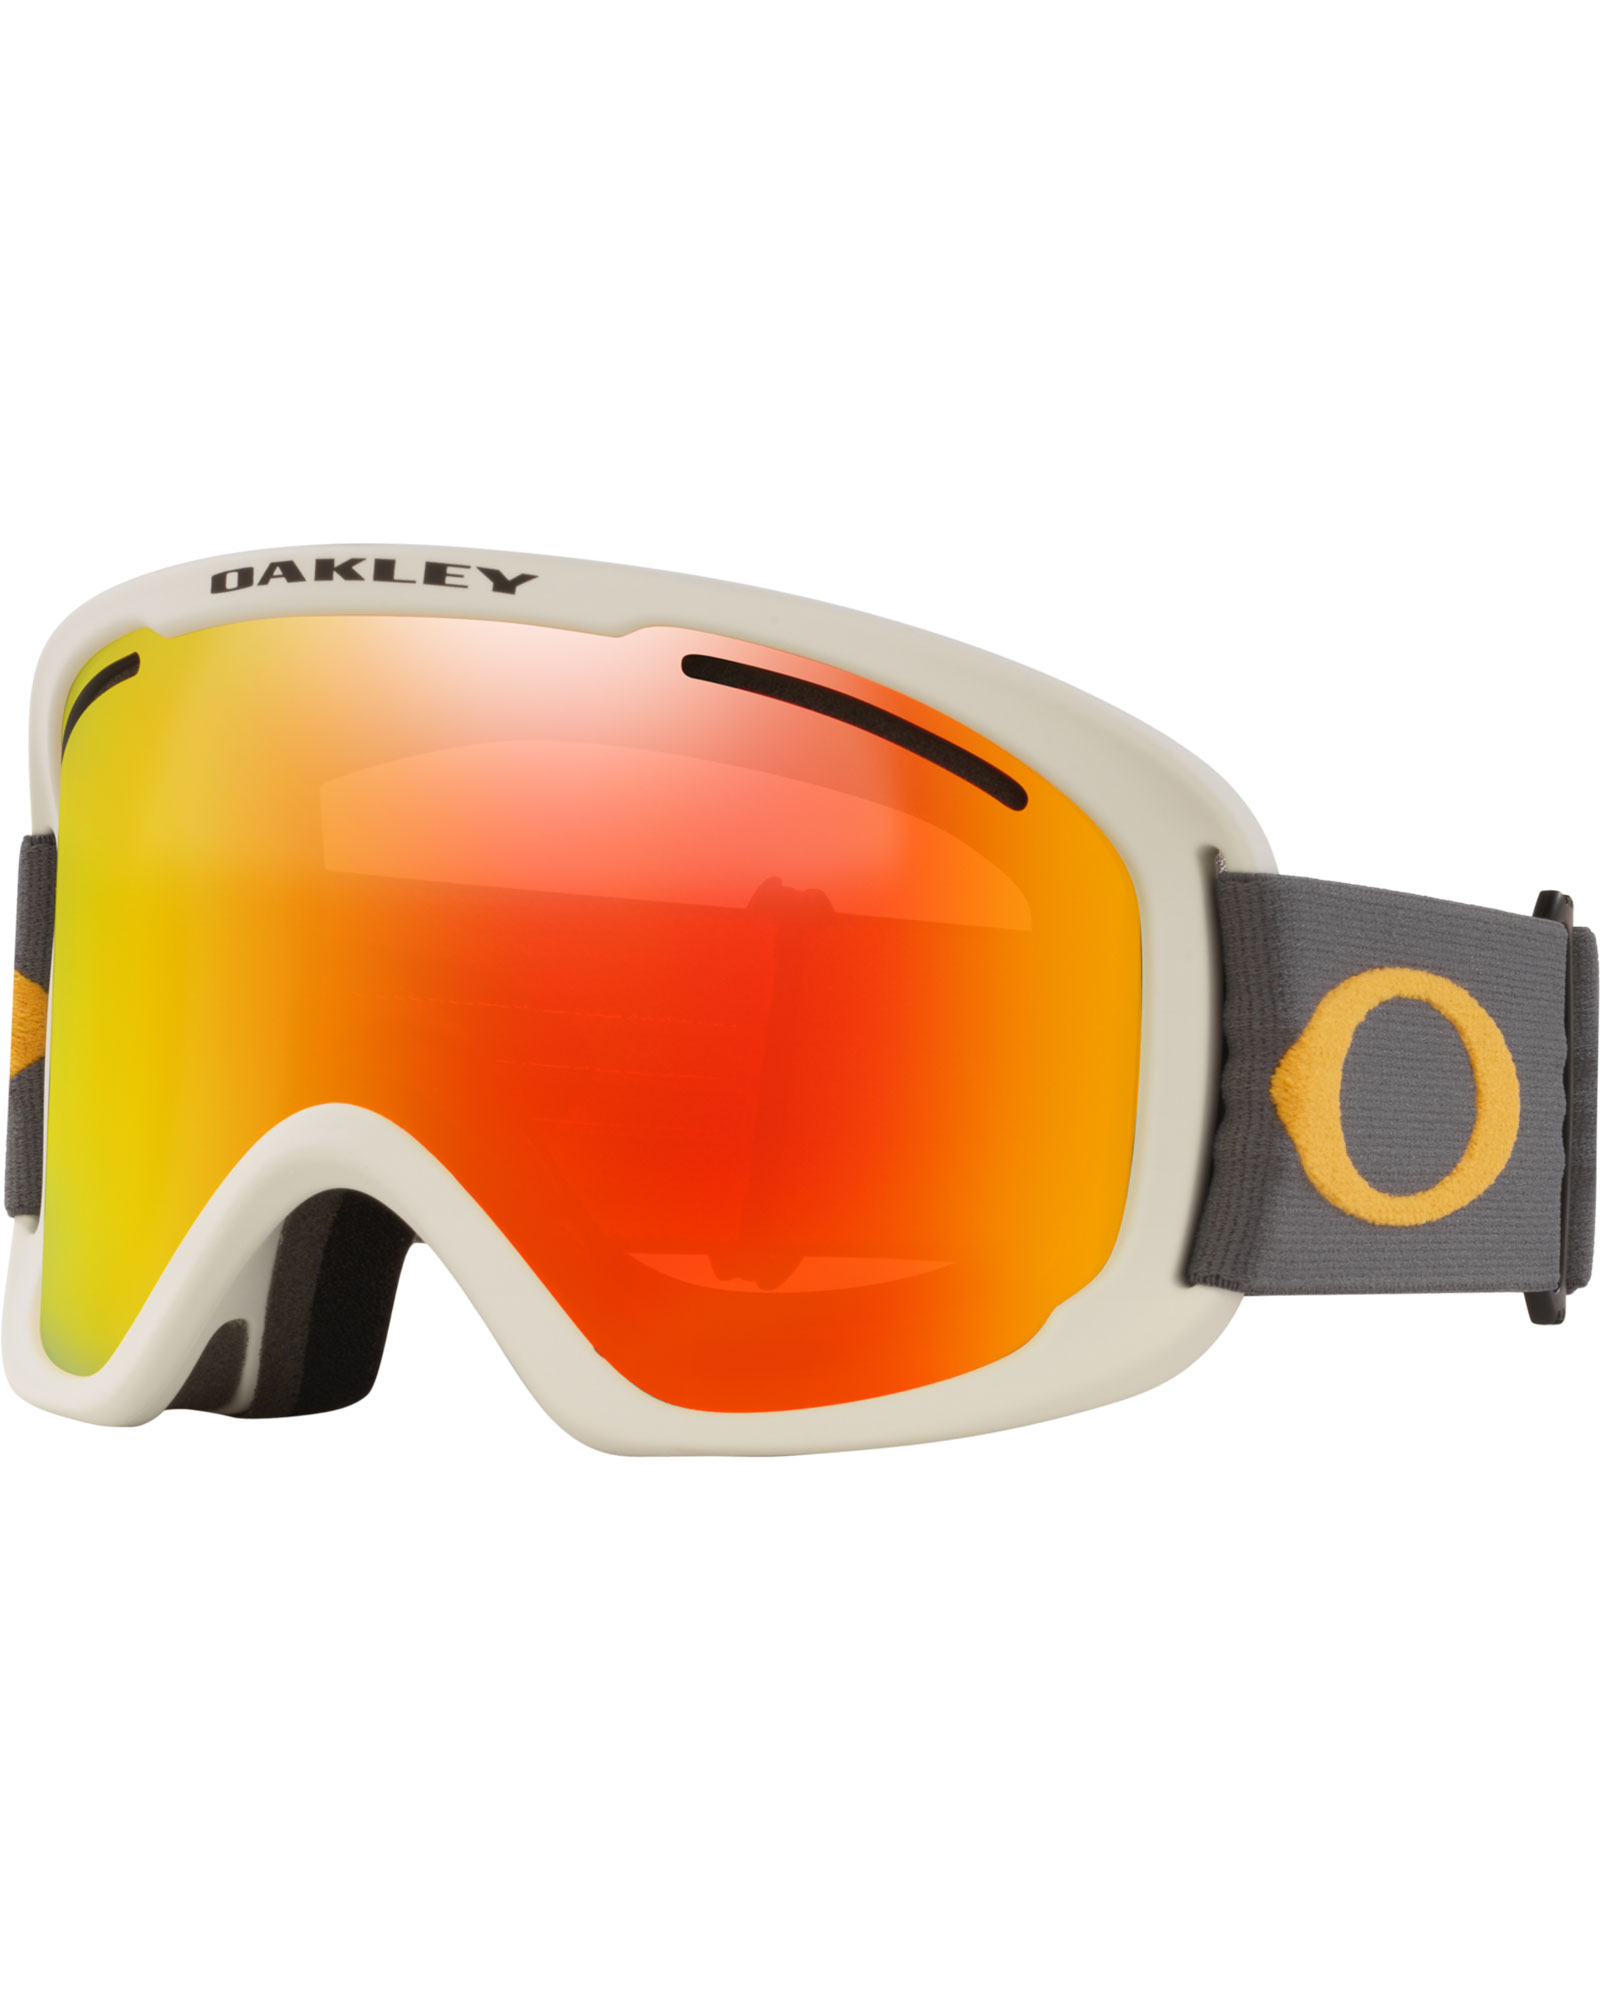 Oakley O Frame 2.0 Pro XL Dark Grey Orange / Fire Iridium + Persimmon Goggles 2020 / 2021 0